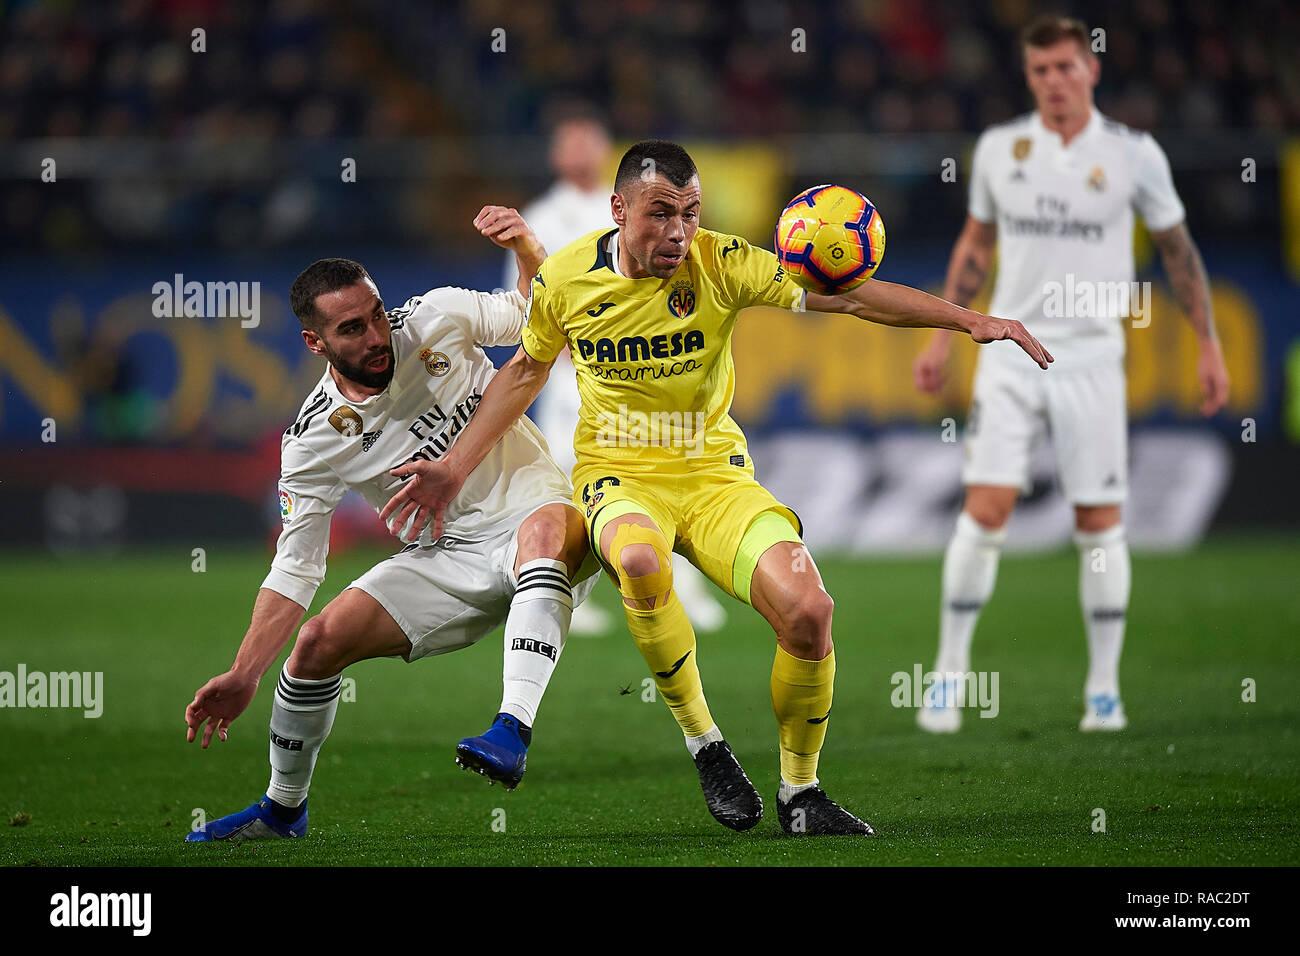 VILLARREAL LaLiga Date Villarreal Real Madrid Javi Fuego Of Villarreal CF And Daniel Carvajal Of Real Madrid During The Game Villarreal Real Madrid Stock Photo Alamy